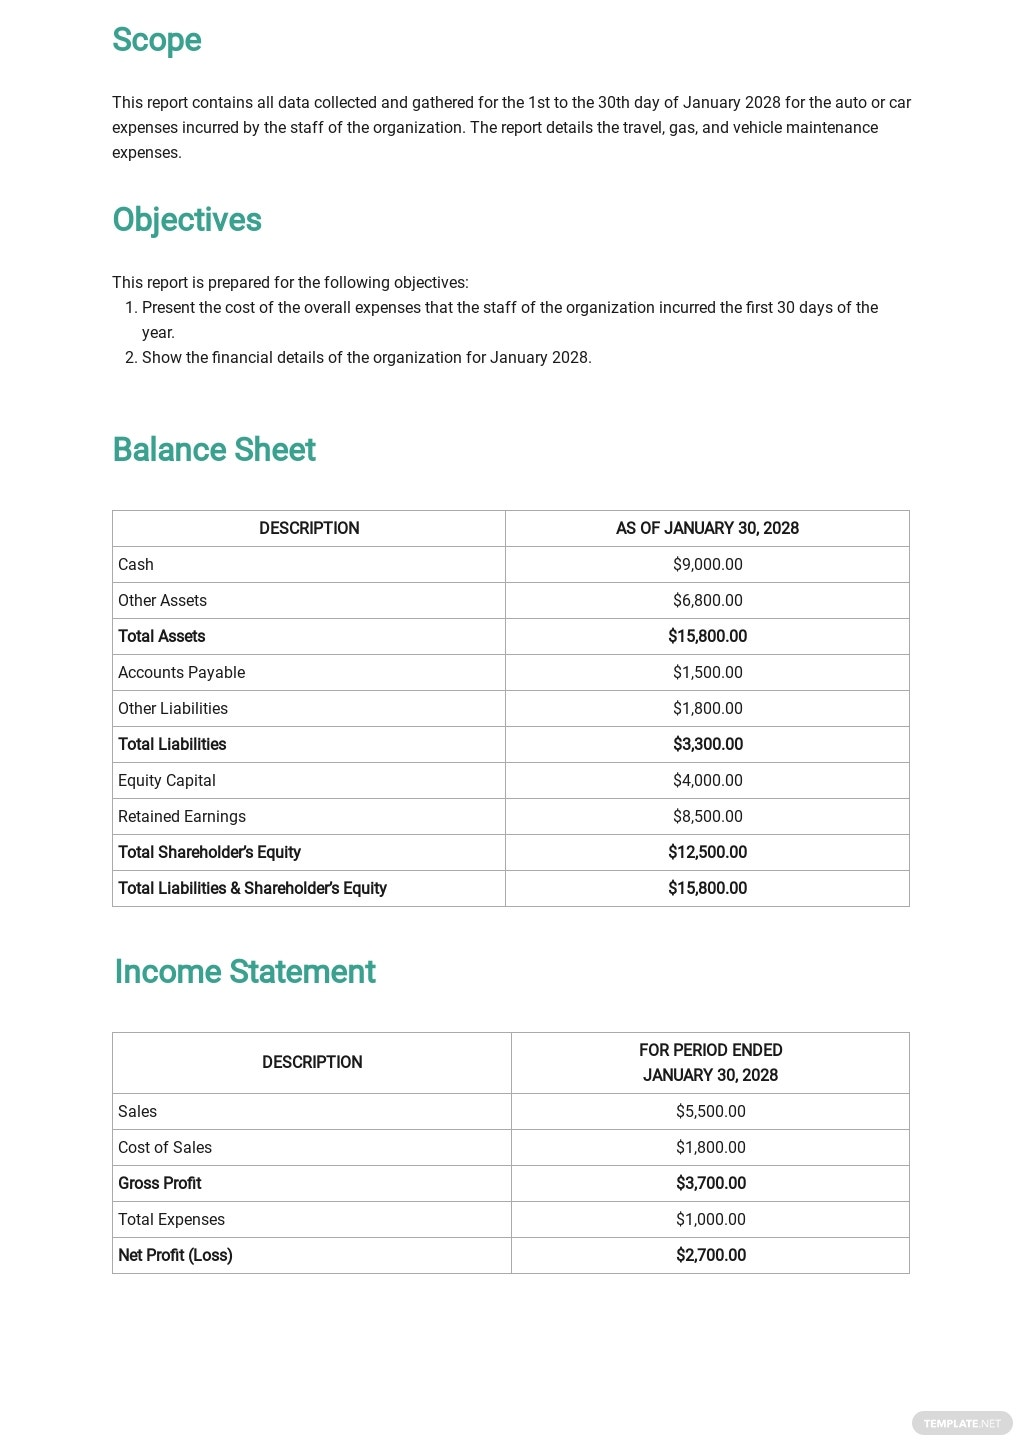 Auto Expense Travel Report Template 1.jpe